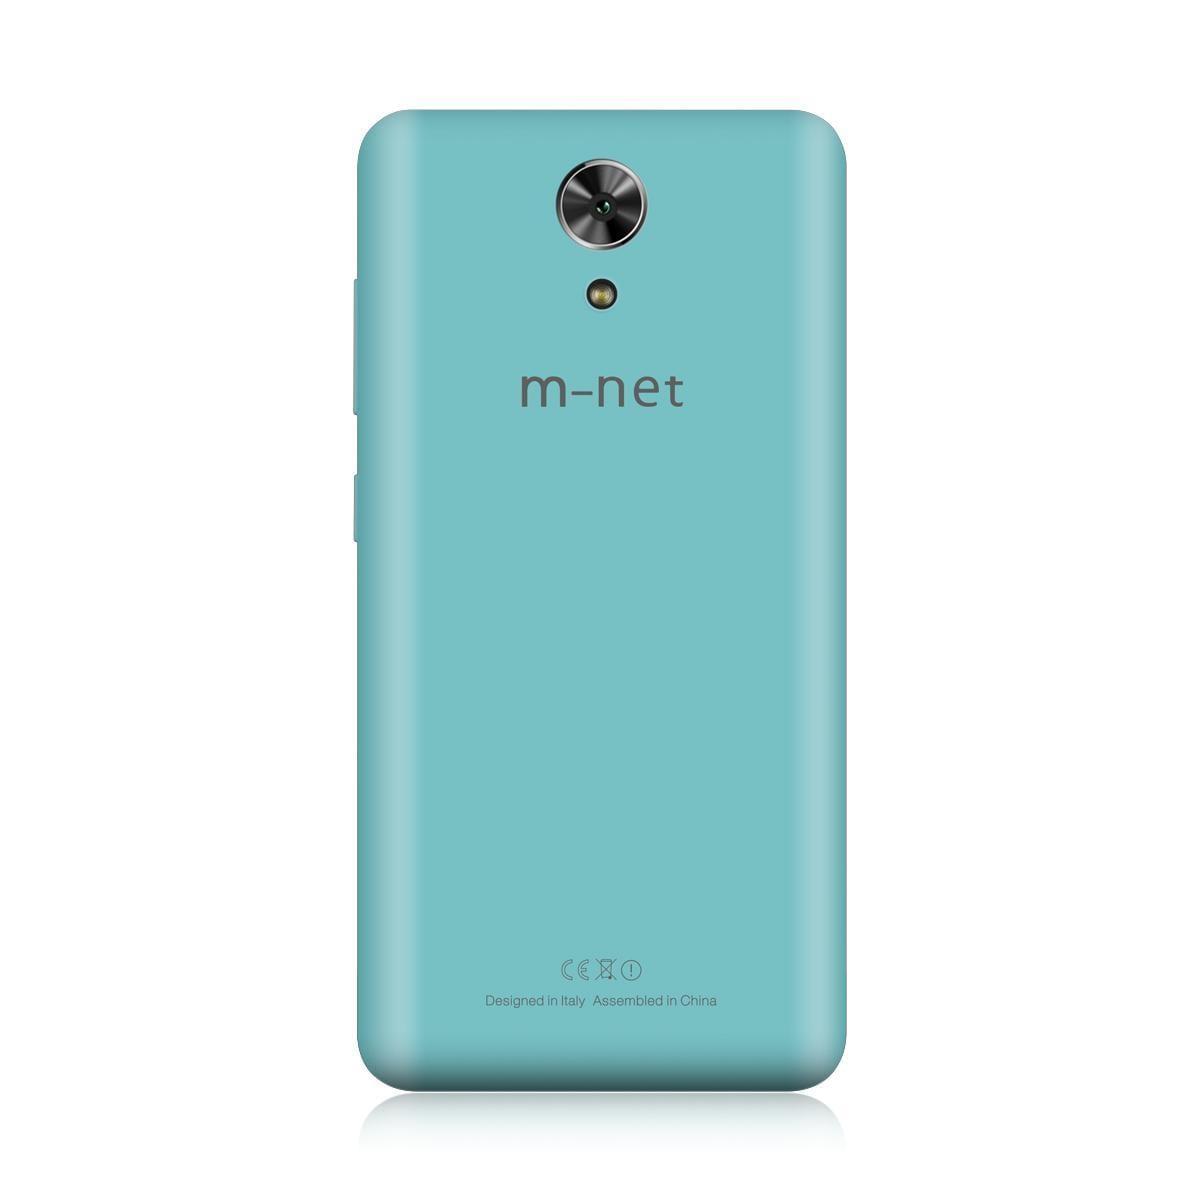 m-net выпустила смартфон Power 1 с аккумулятором 5050 мАч и быстрой зарядкой (Power 1 Mint green cover)